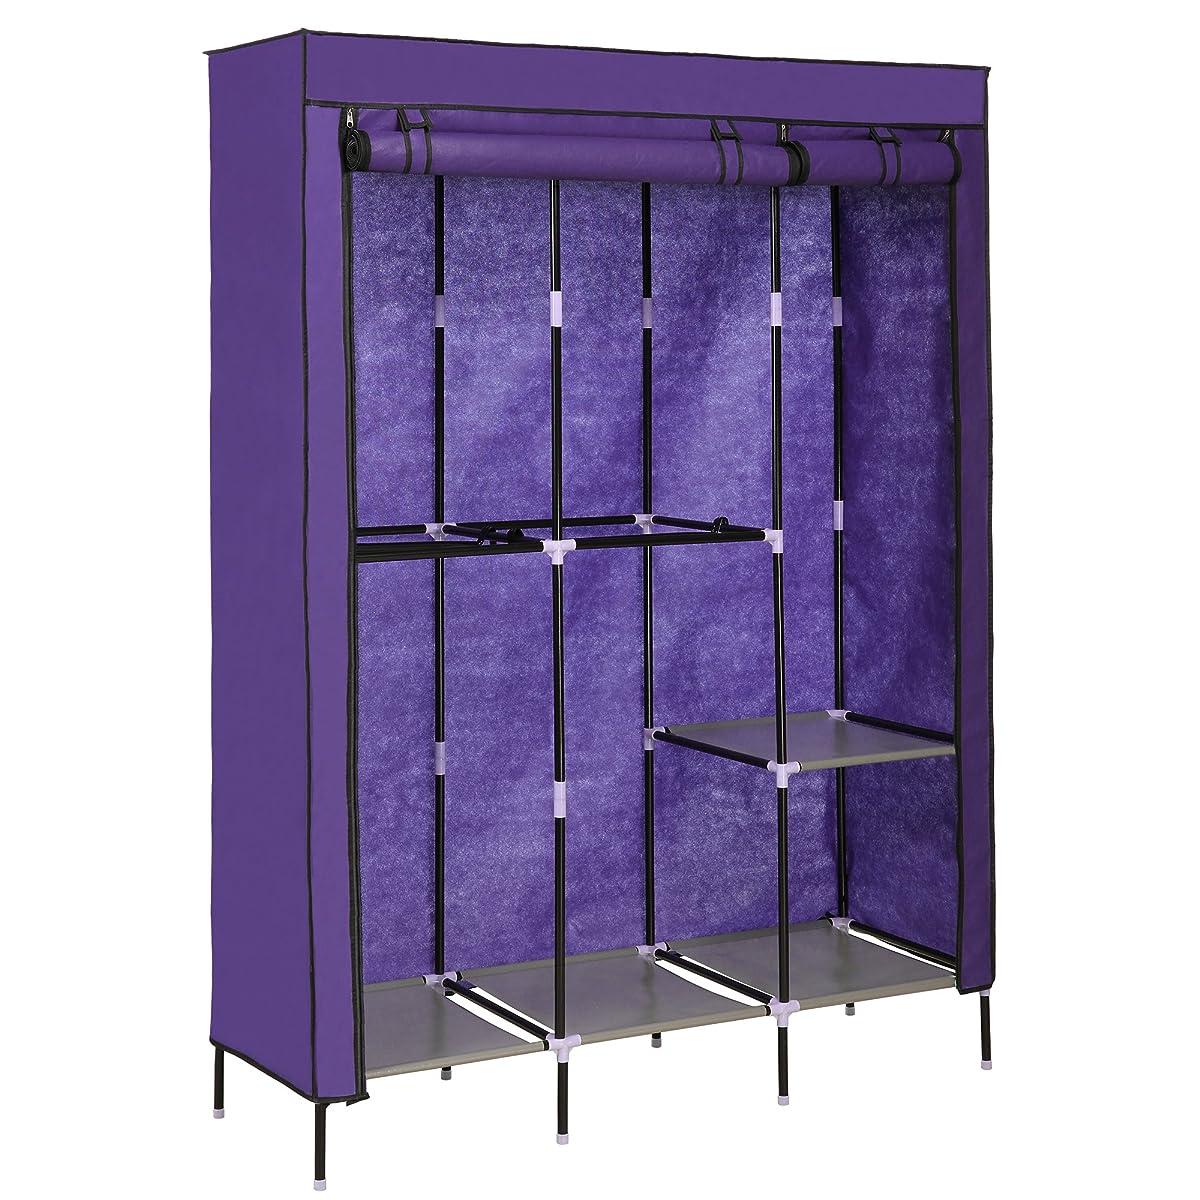 Homdox Storage Organizer Wardrobe Clothing Closet Freestanding Double Rod Non-woven Fabric Organizer w/Shelves